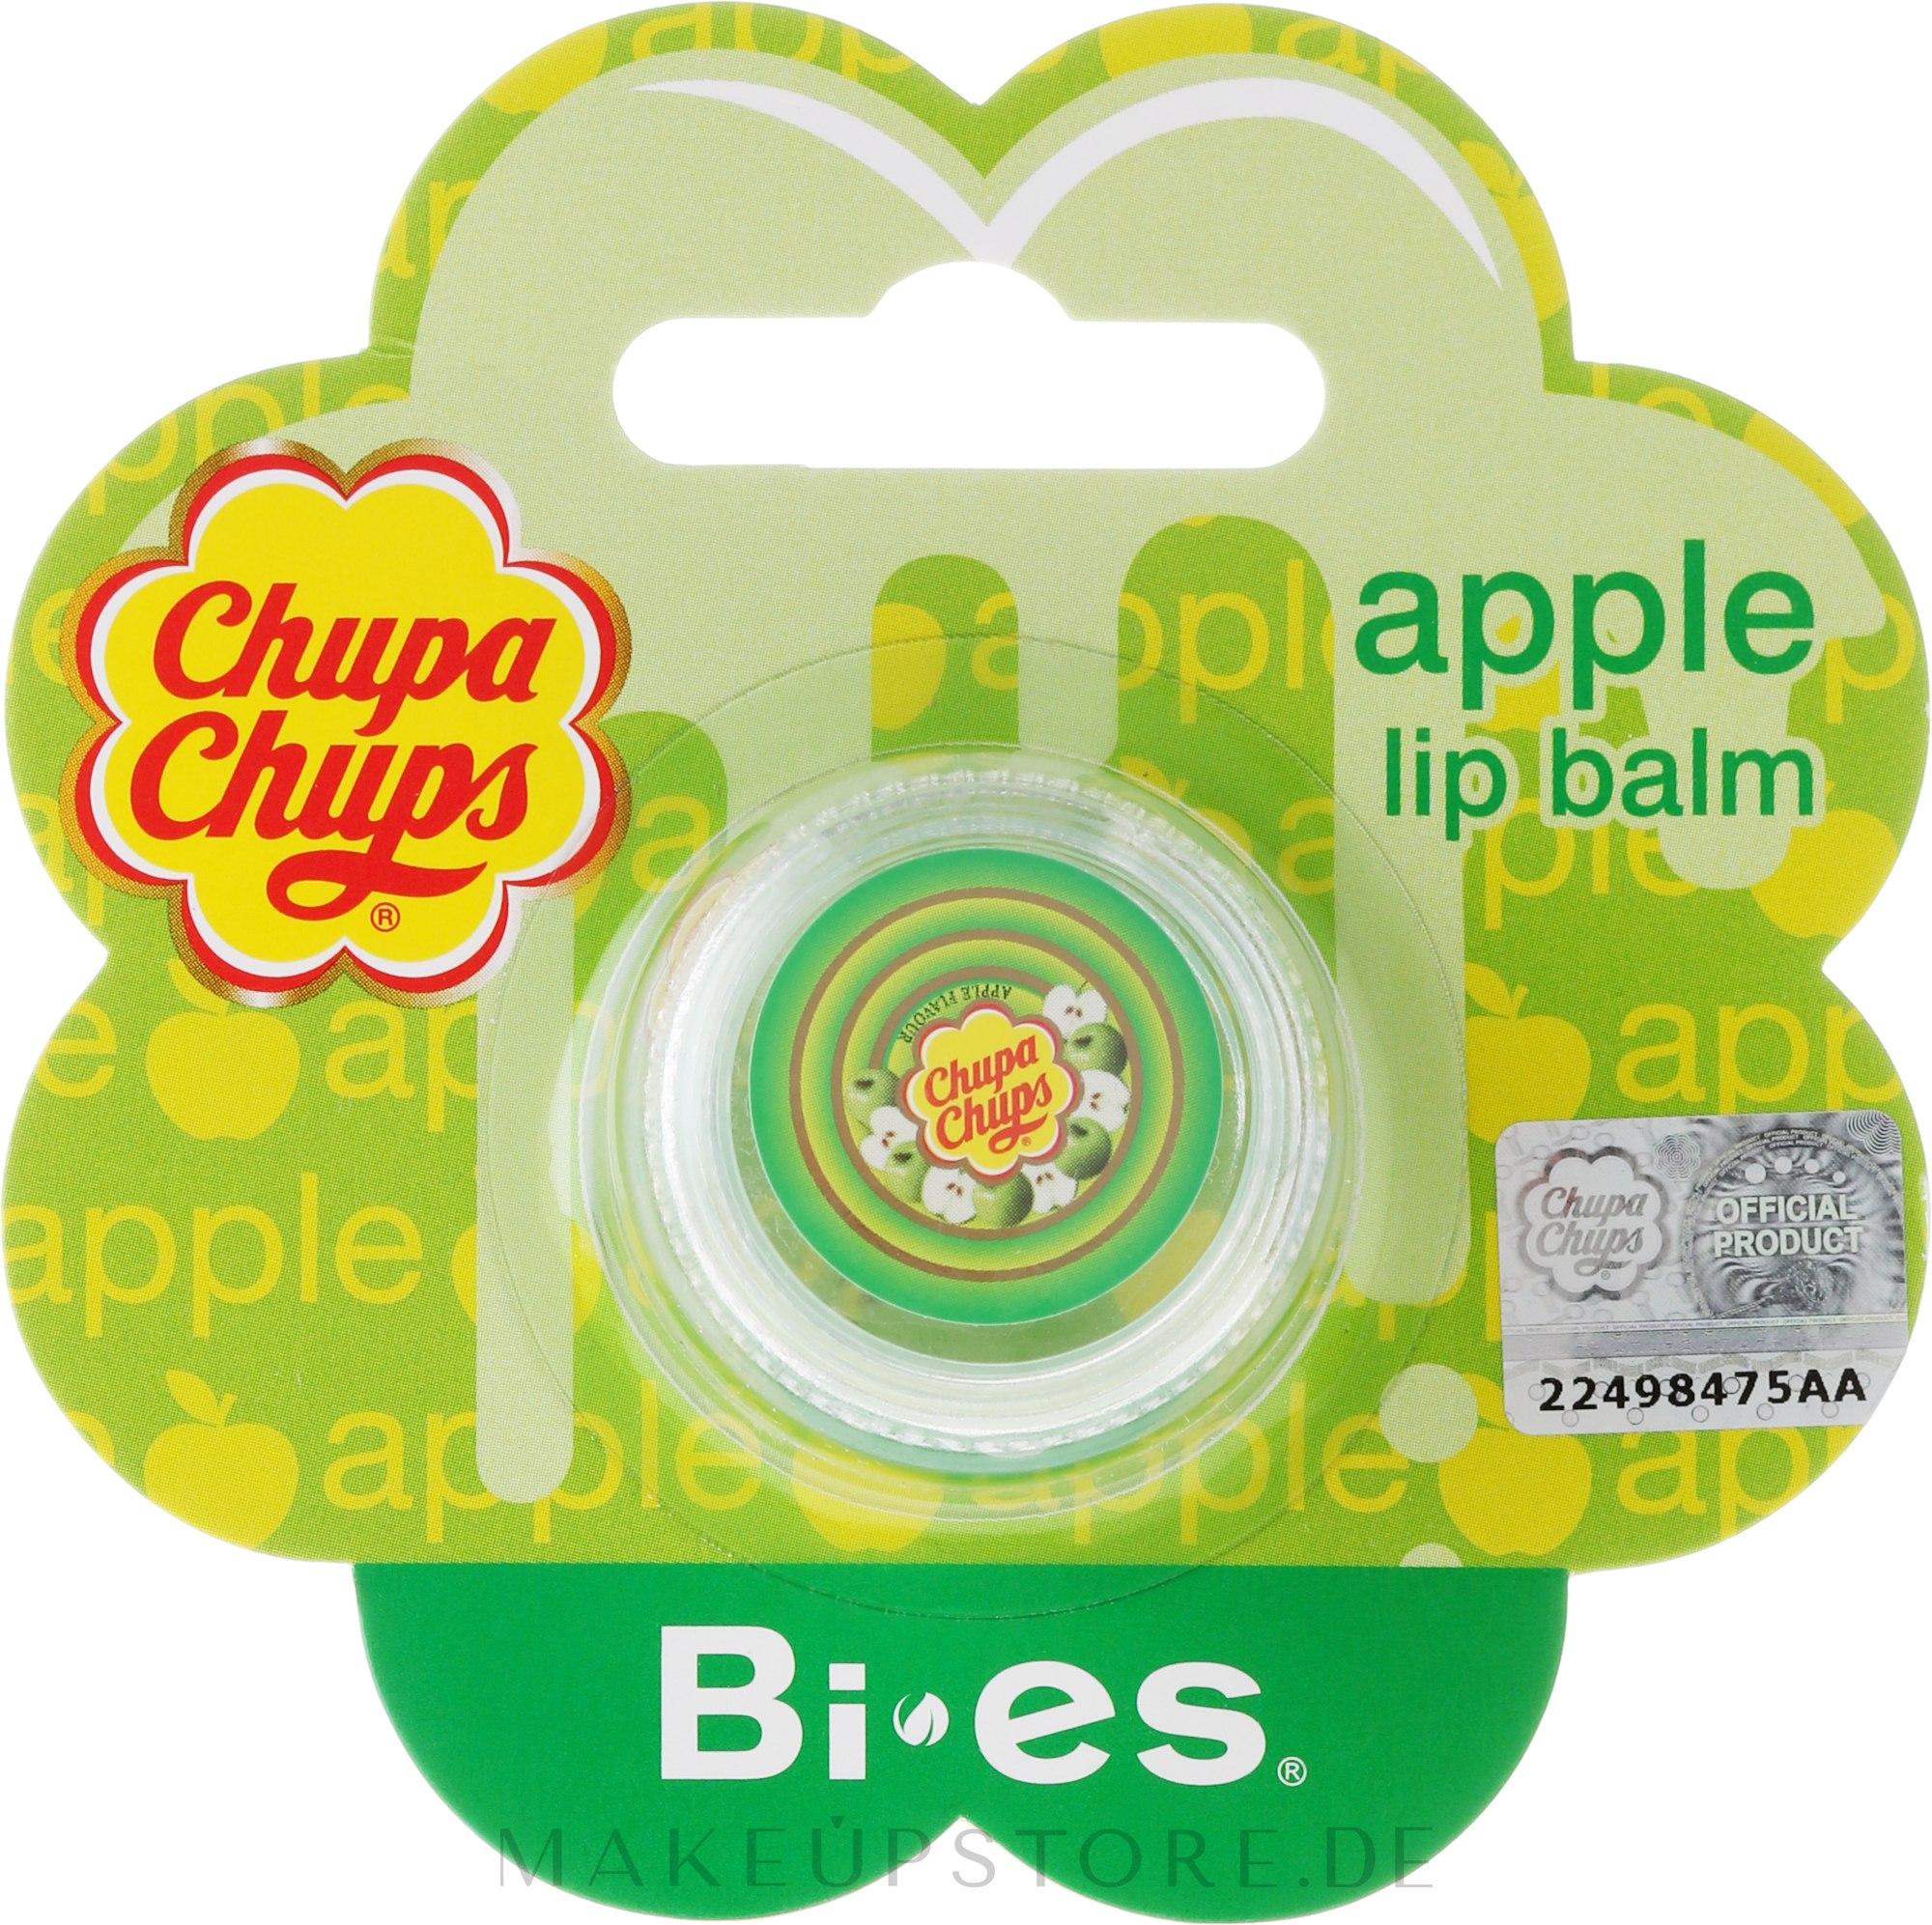 Lippenbalsam mit Apfel Geschmack - Bi-es Chupa Chups Apple Lip Balm — Bild 5 g